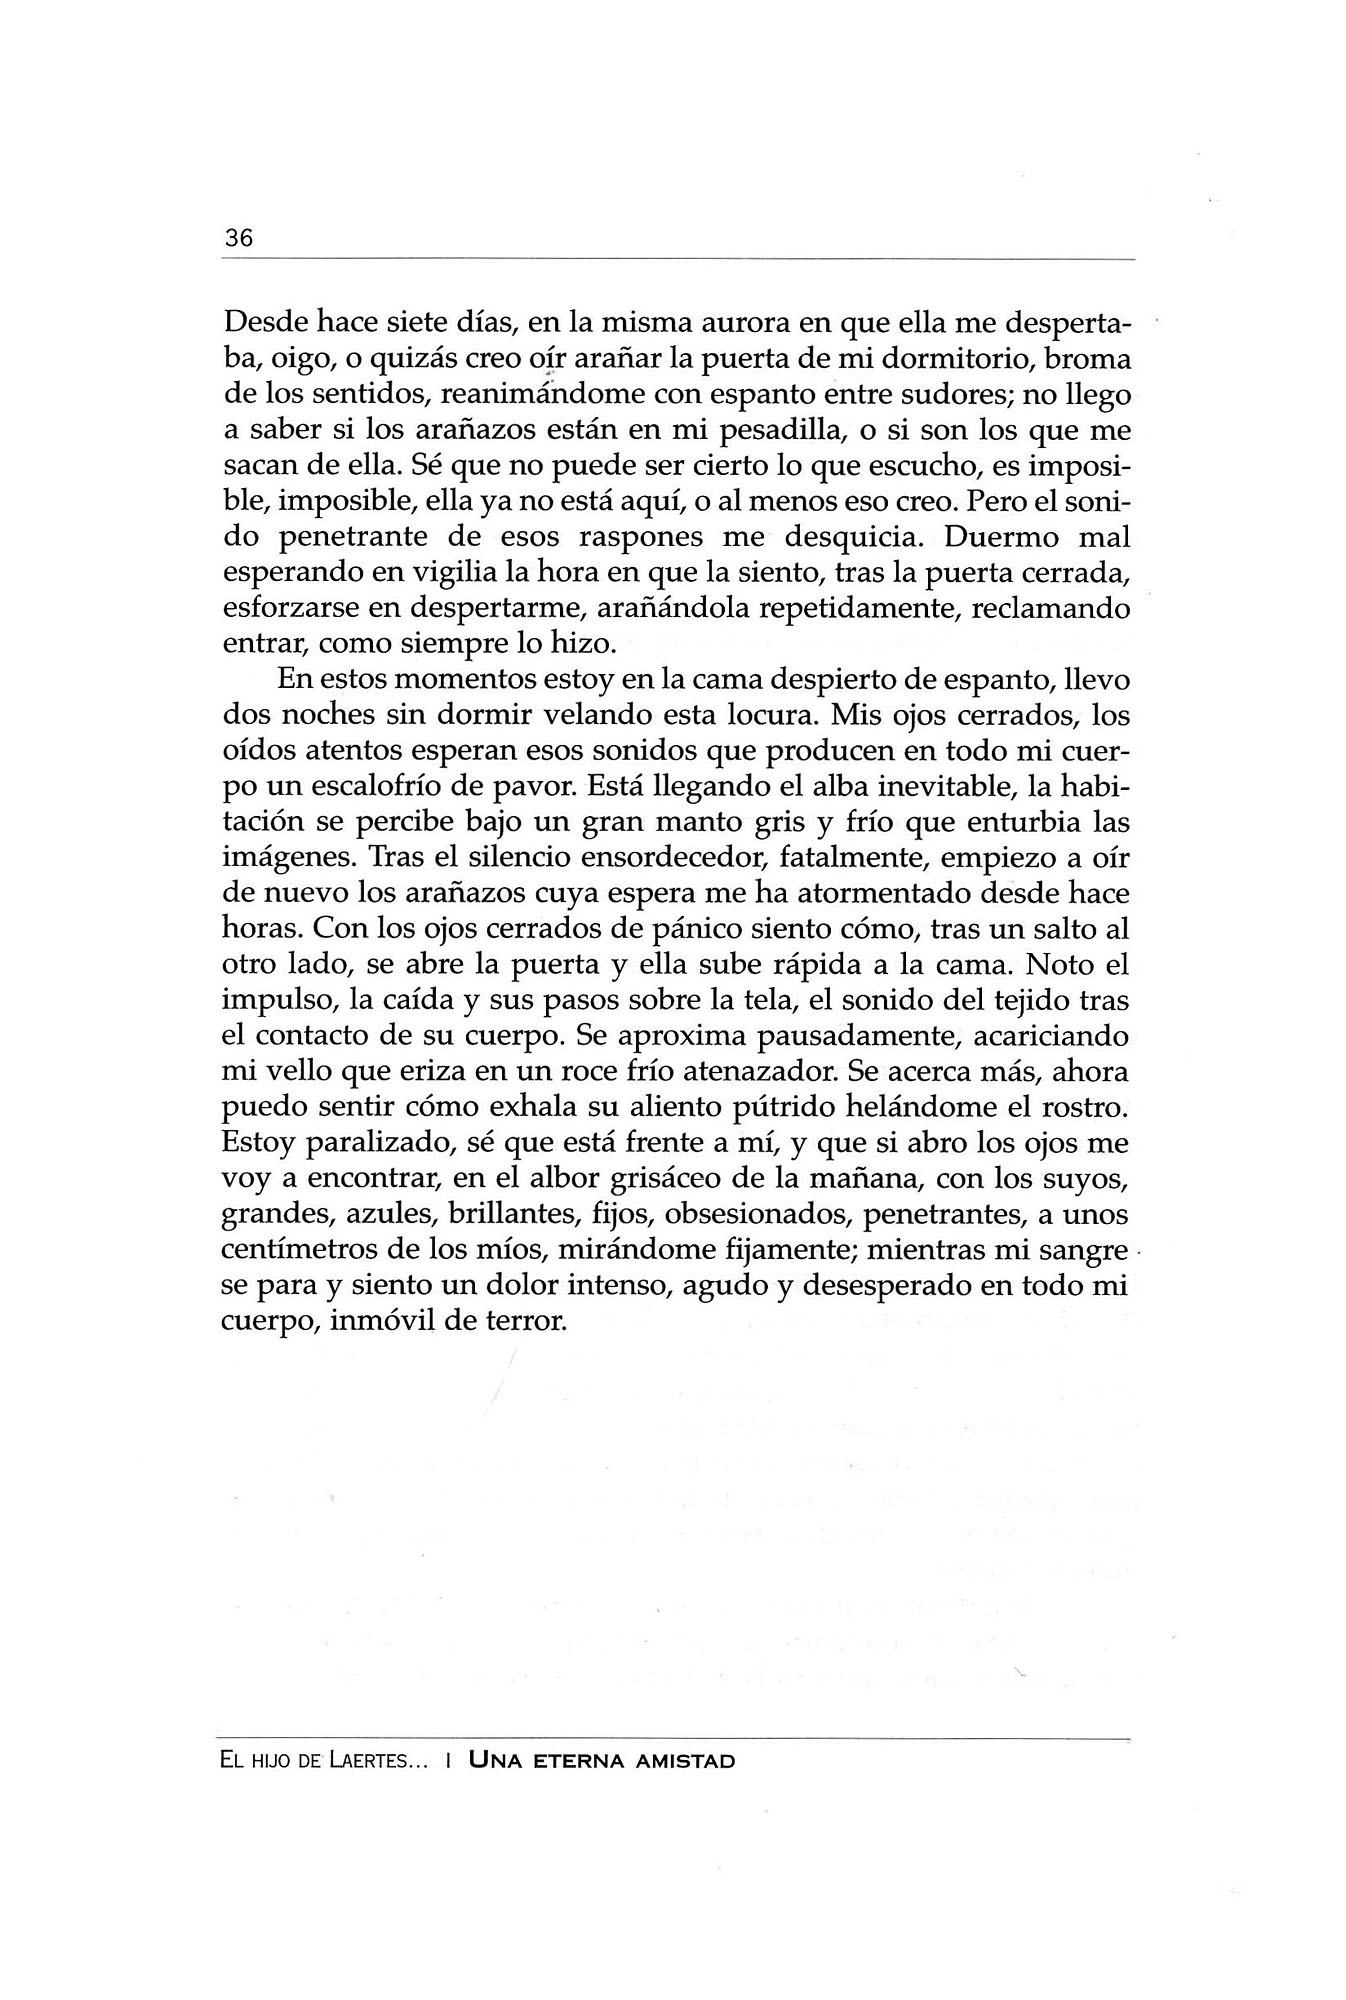 danielvillalobos-calderonsamaniego-shortstory-spanishliterature-7